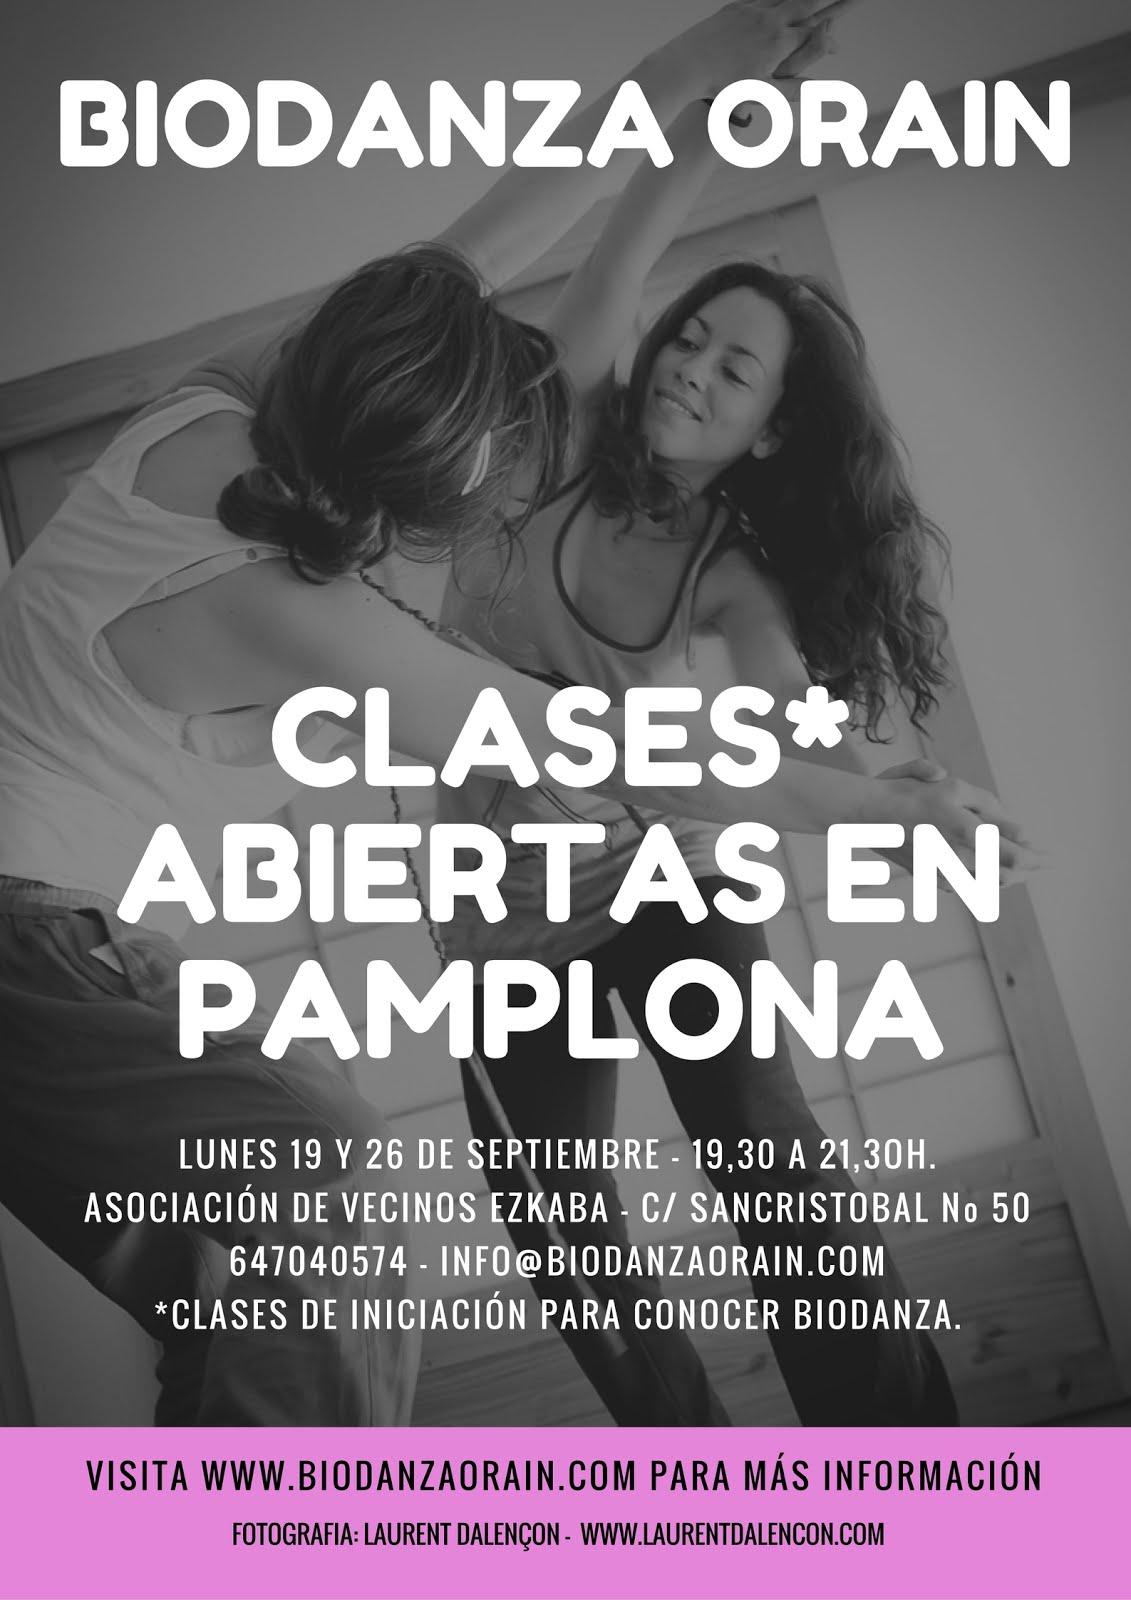 CLASES ABIERTAS EN PAMPLONA